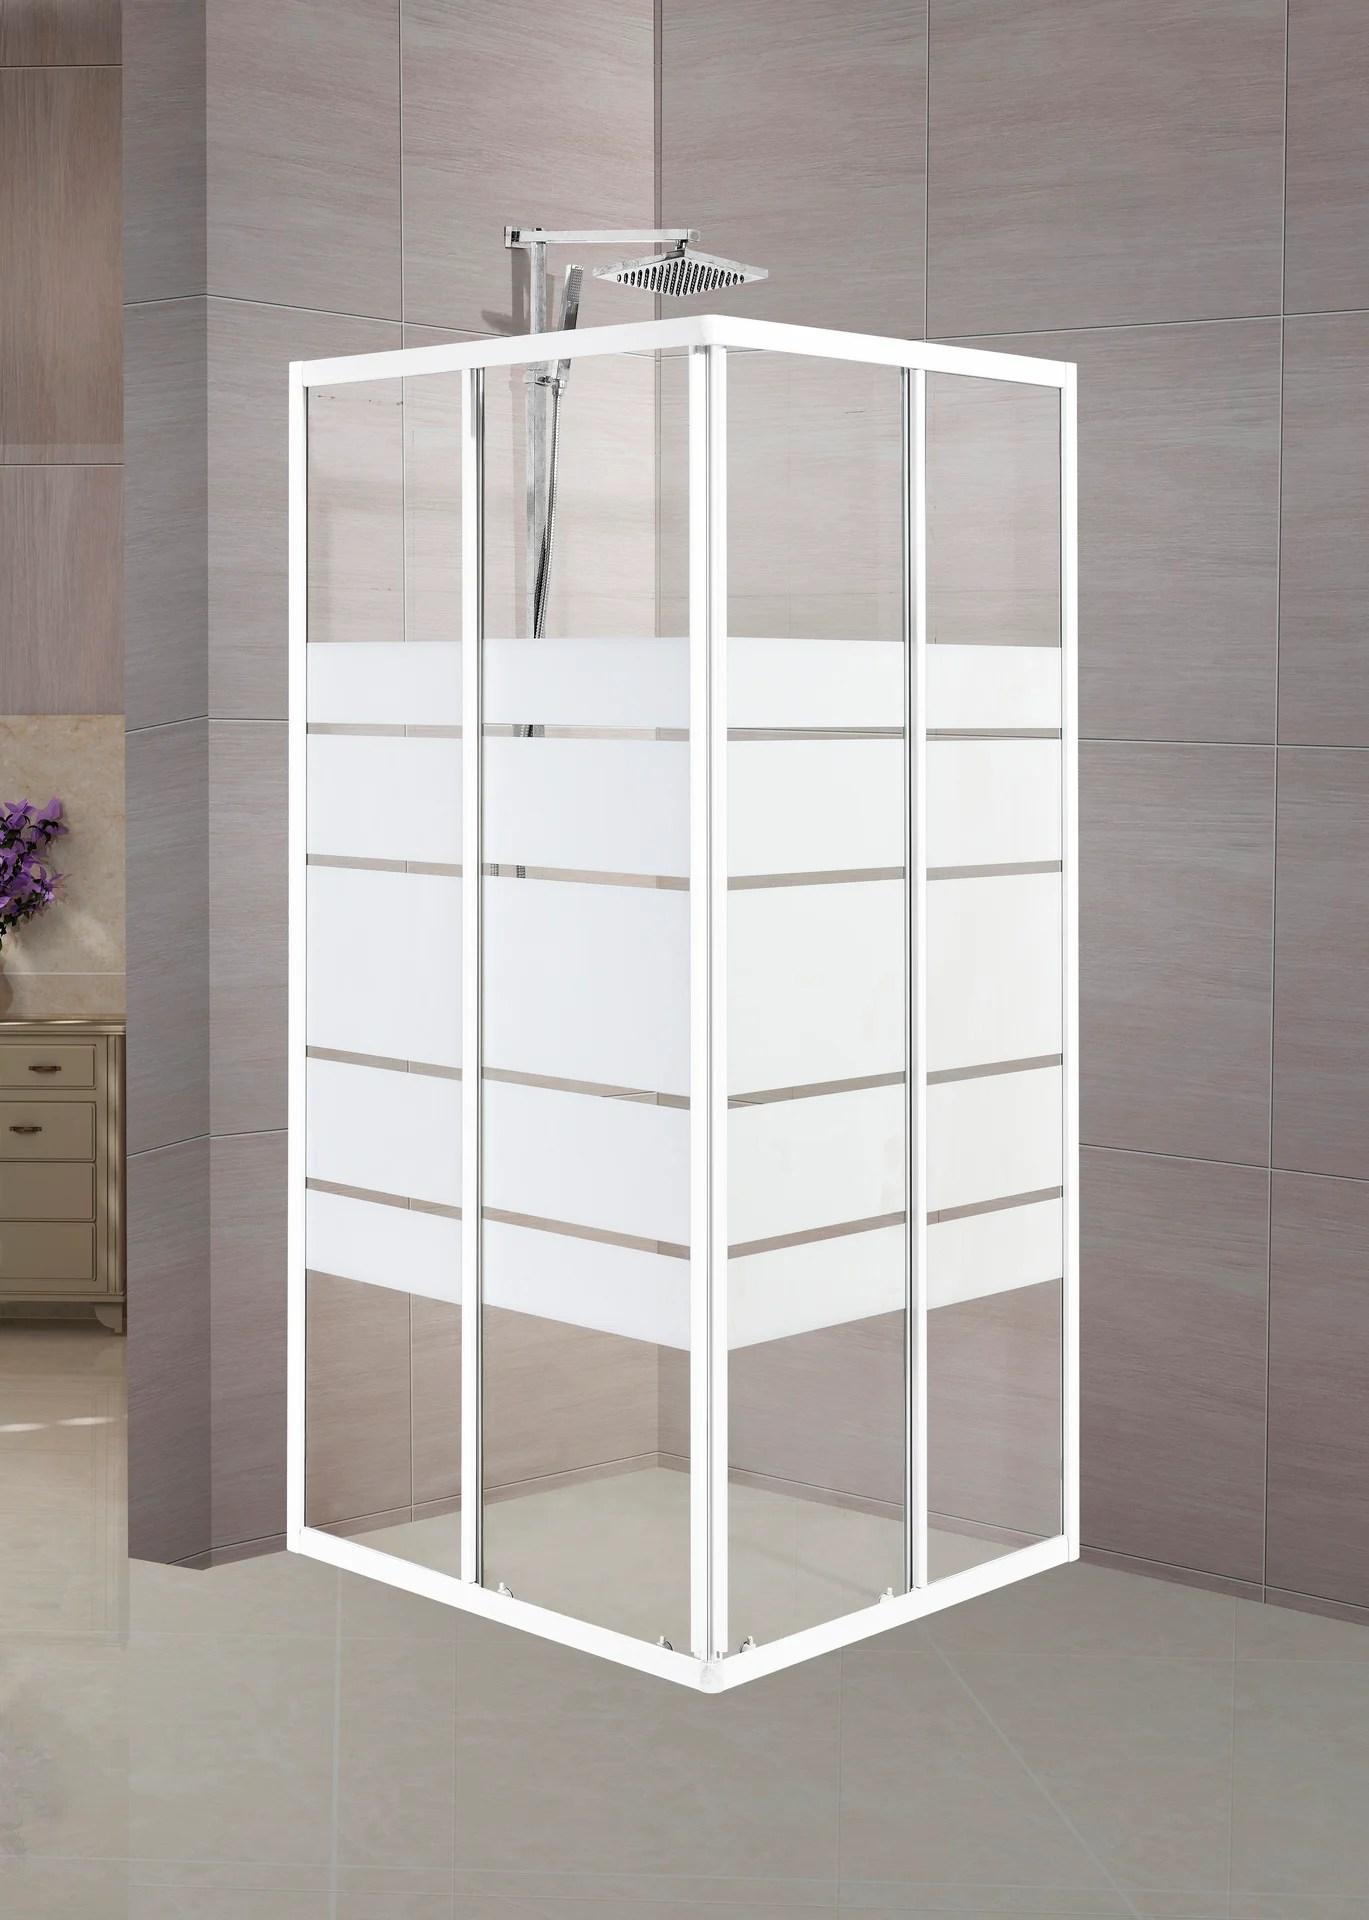 porte de douche angle carre l 70 cm x